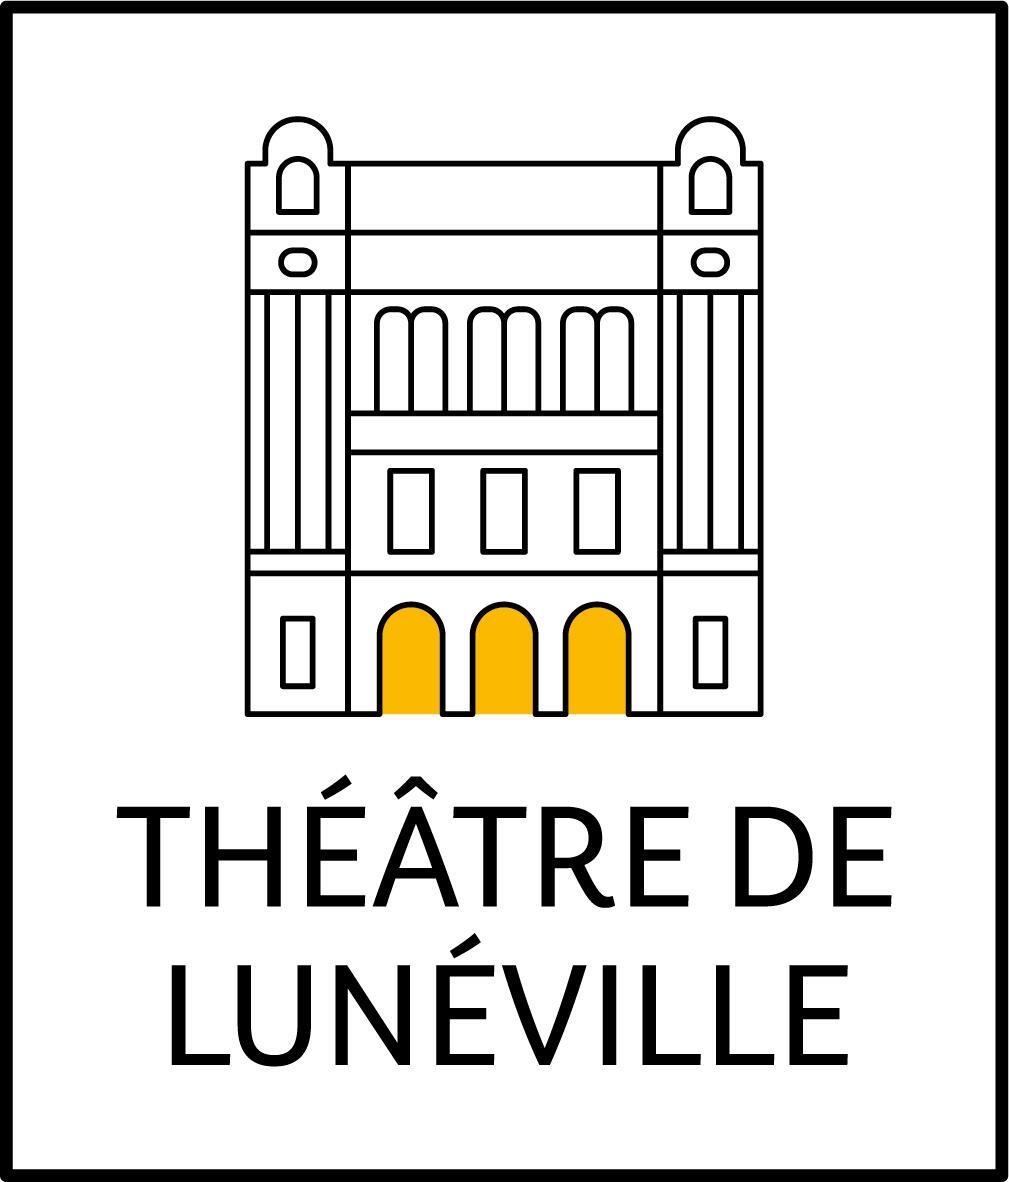 theatreluneville_logo_2021_1630584366